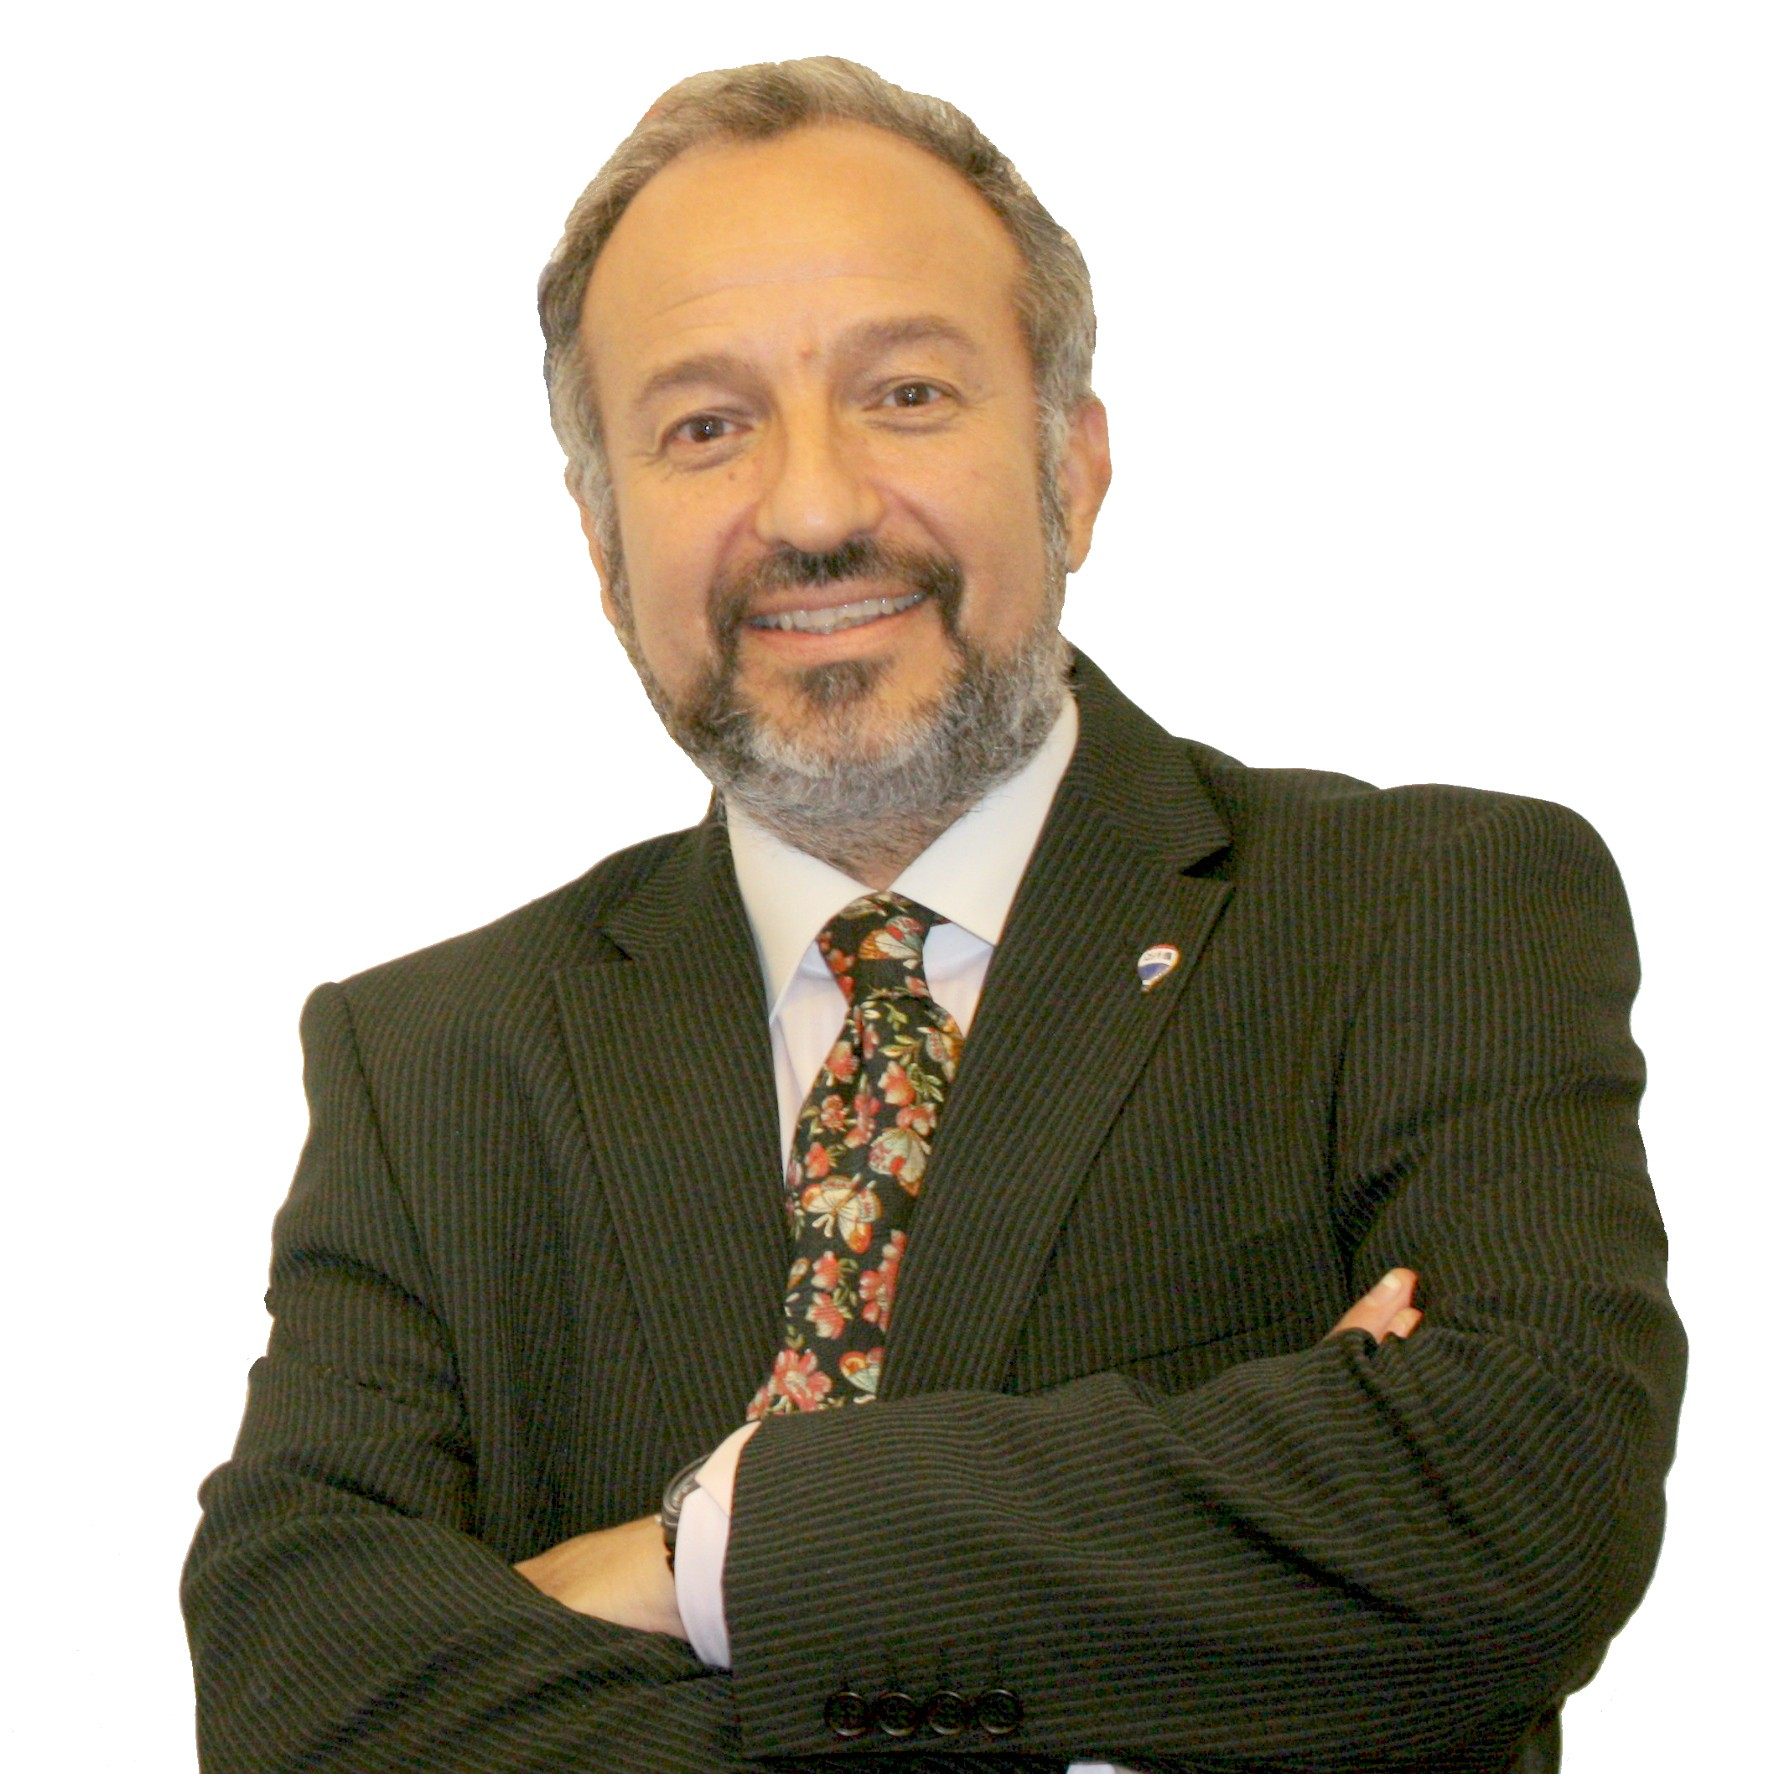 Eduardo Santise